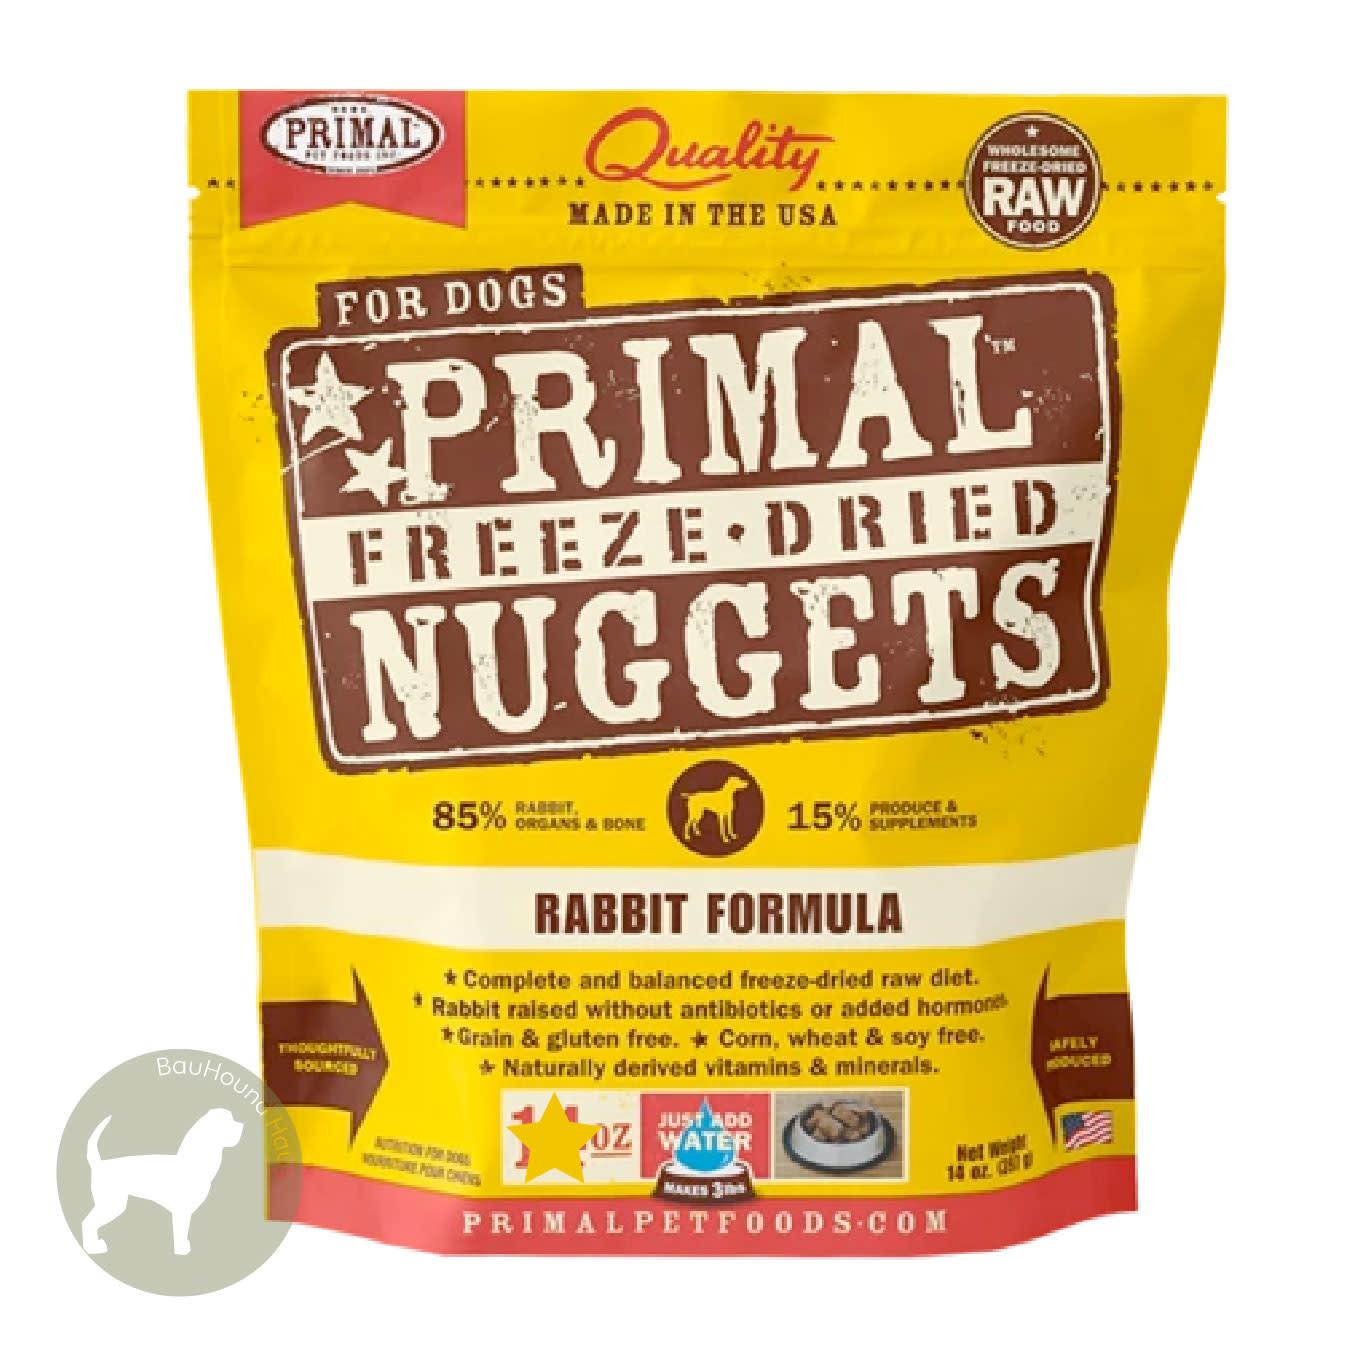 Primal Pet Foods Primal Pet Foods Freeze Dried Formula Rabbit, 14oz